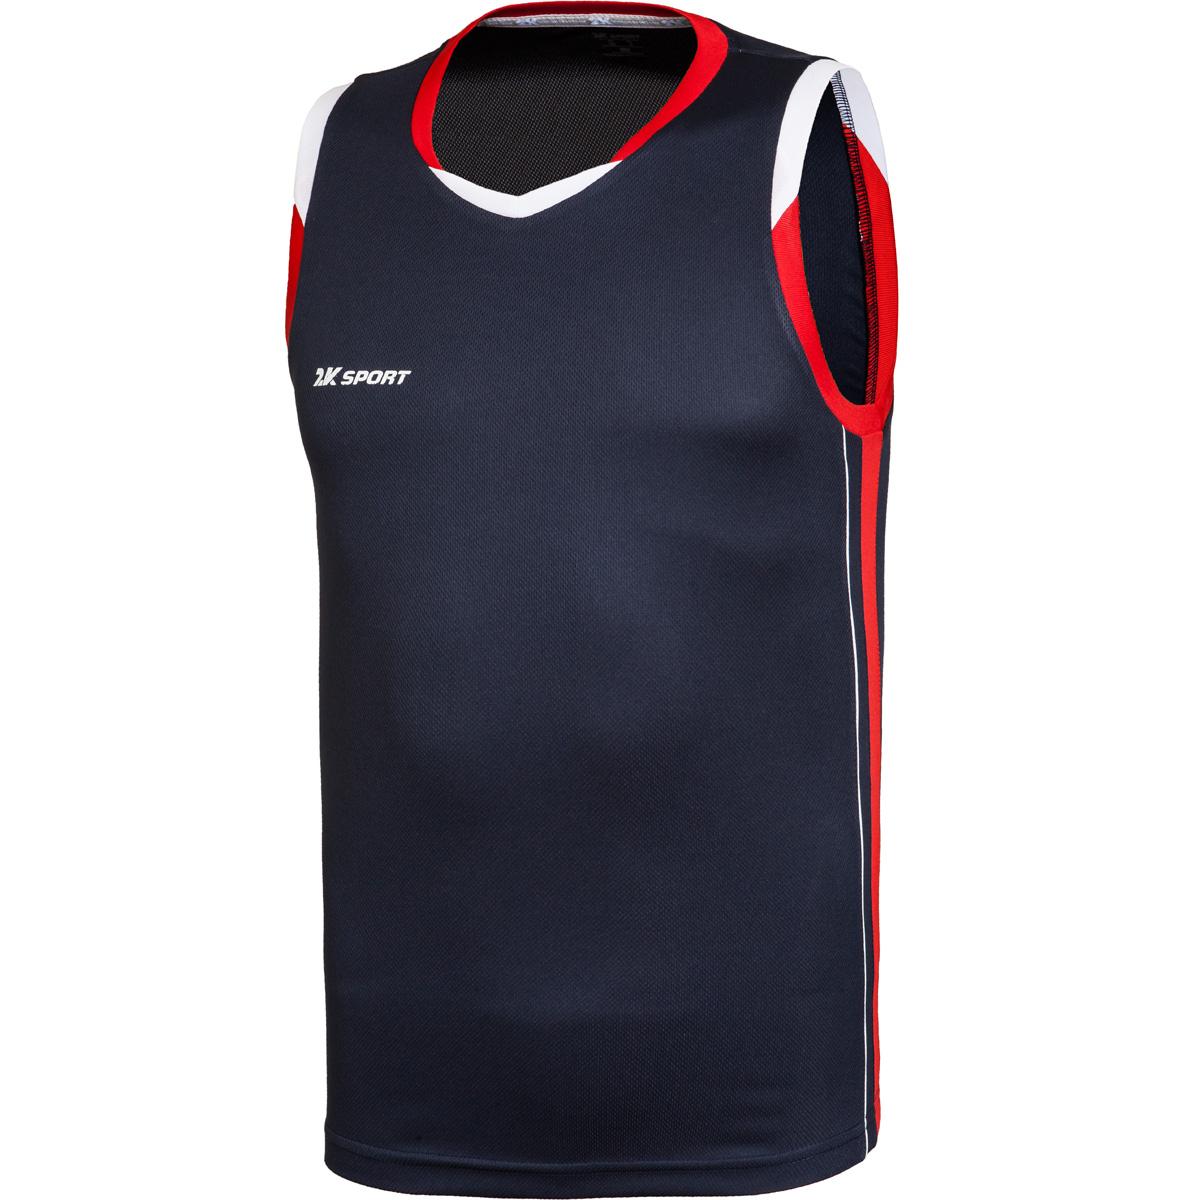 Майка баскетбольная мужская 2K Sport Advance, цвет: темно-синий, красный, белый. 130030. Размер XS (44) - Баскетбол